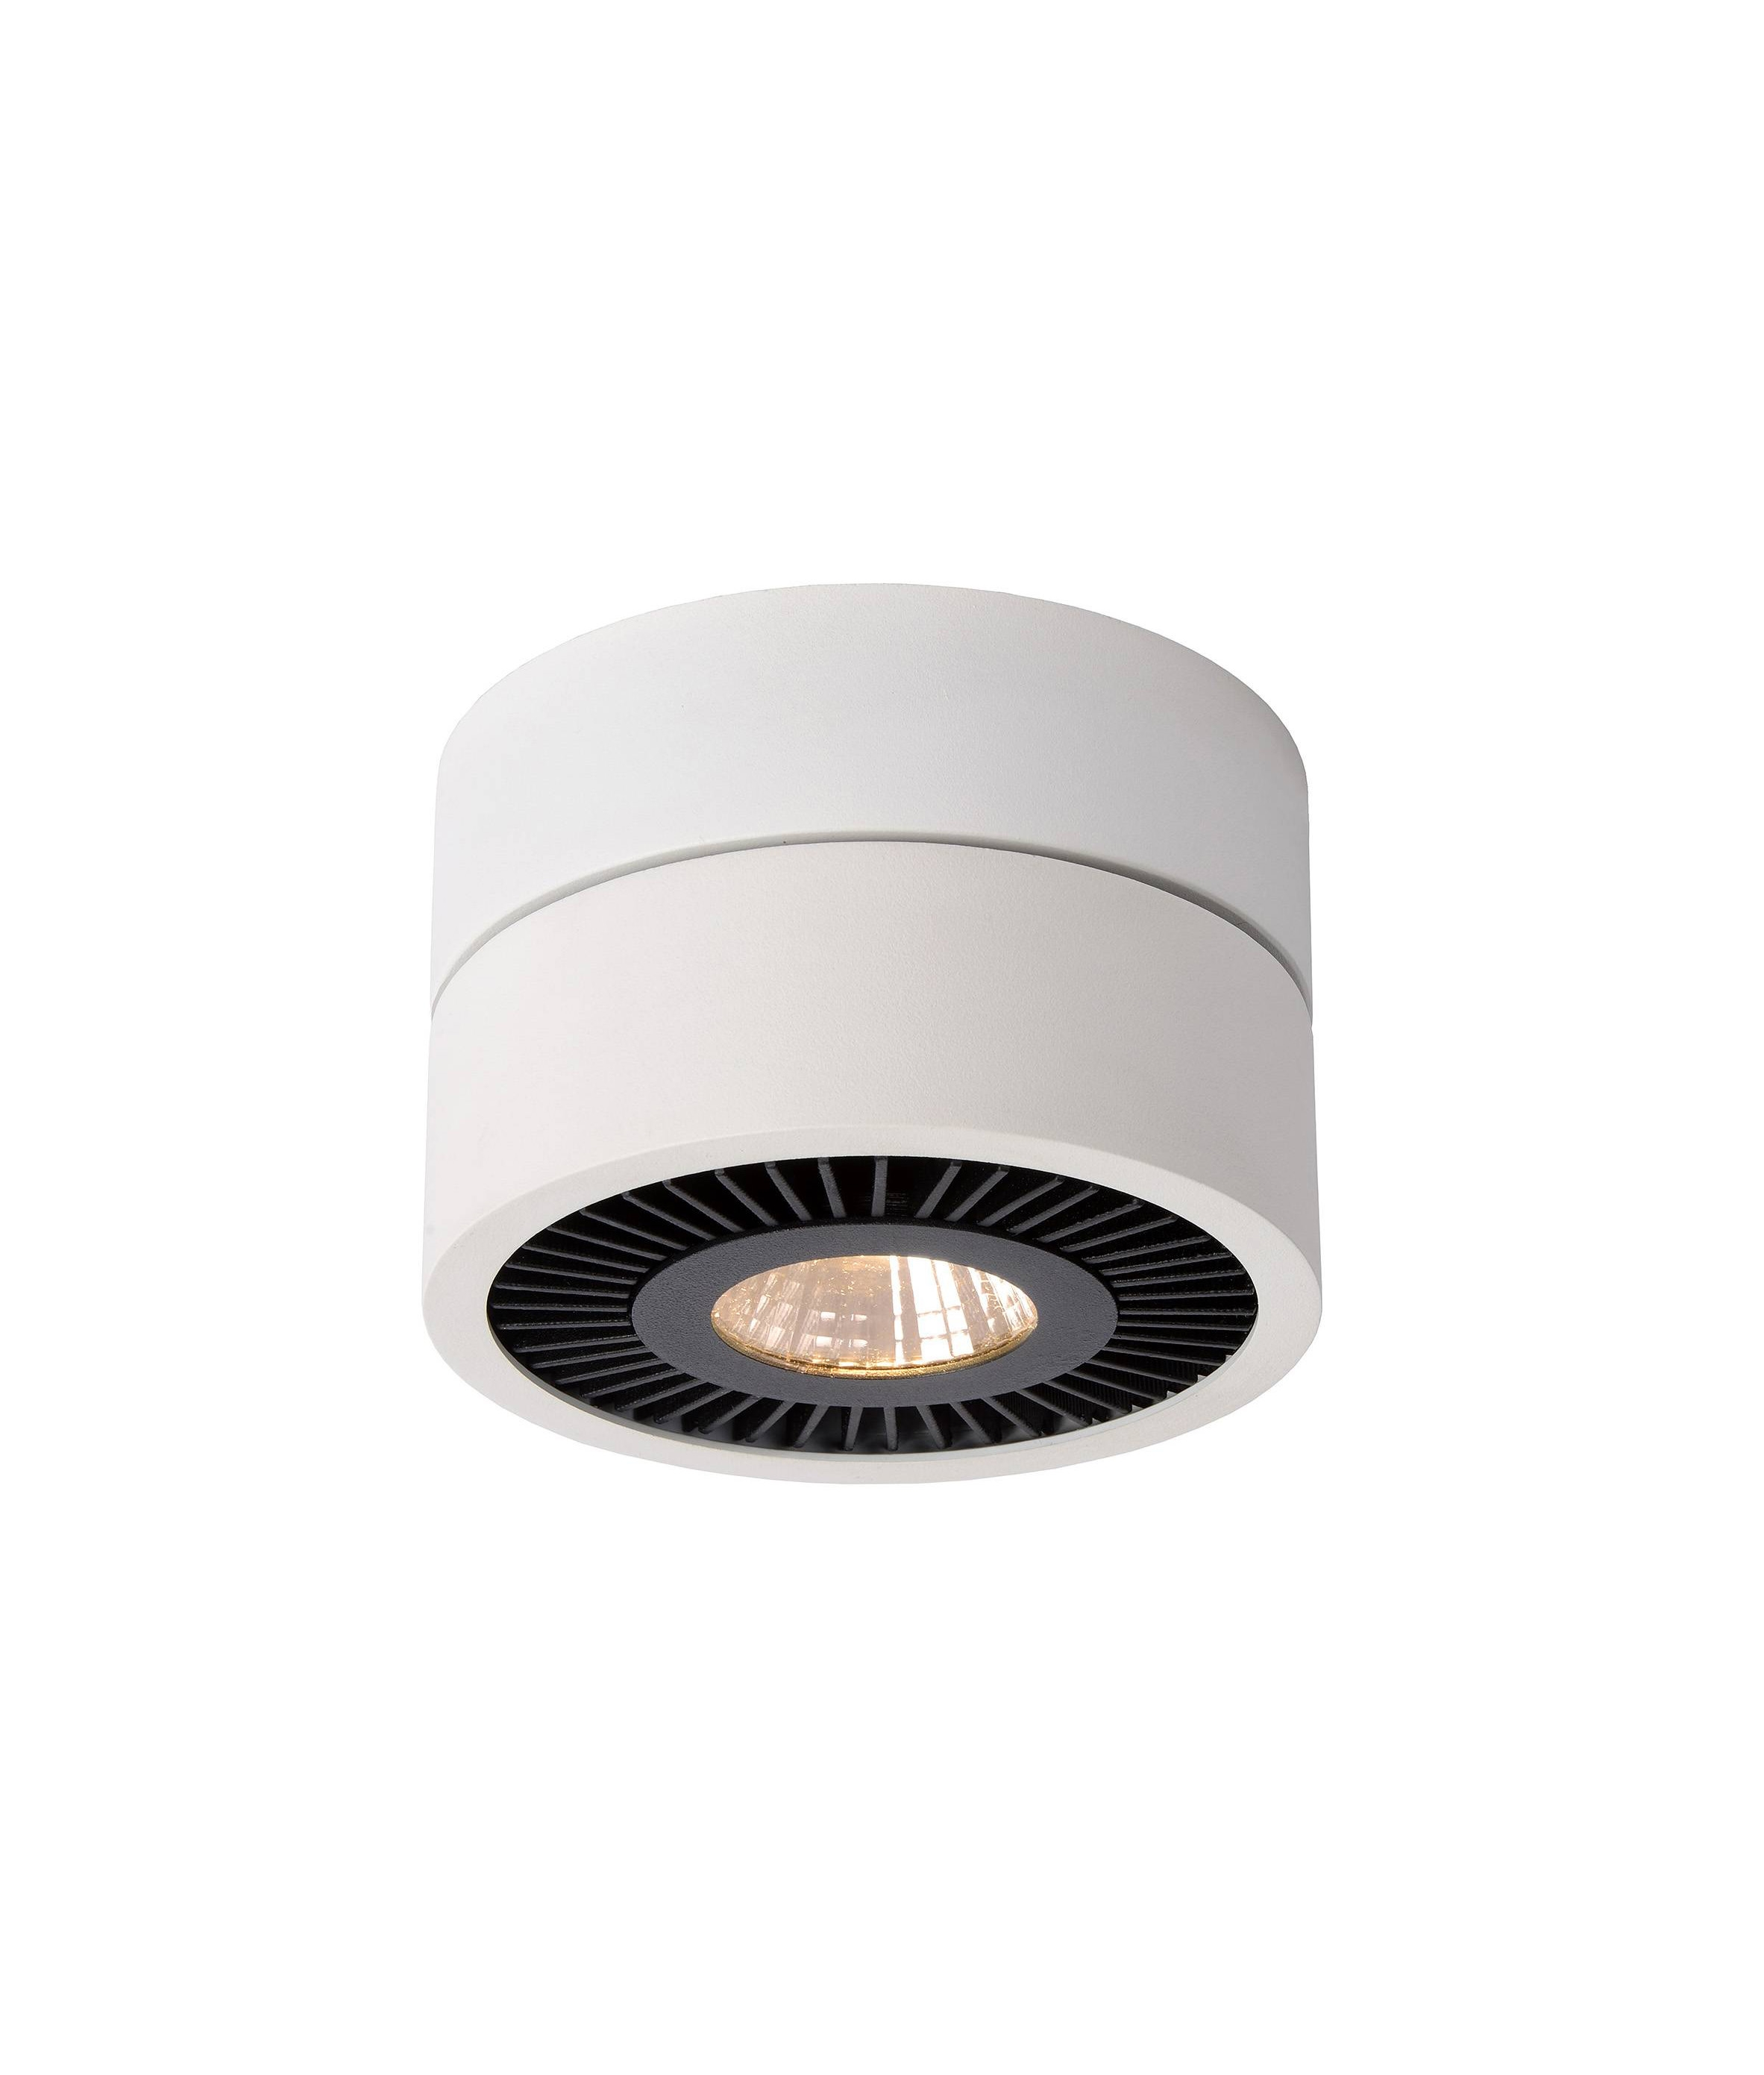 surface mounted white adjustable led downlight. Black Bedroom Furniture Sets. Home Design Ideas